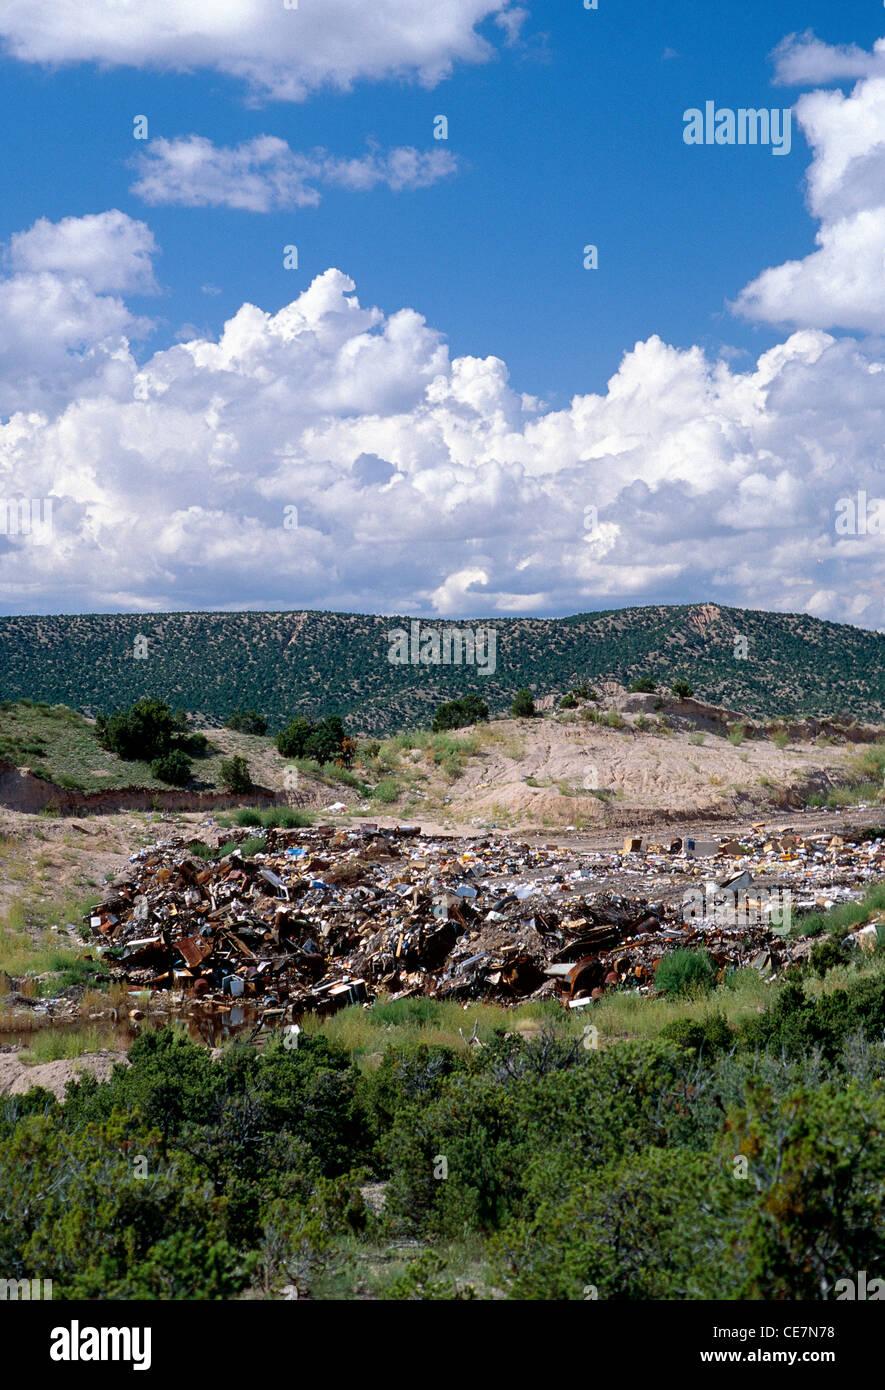 Town dump & landfill, Truchas, New Mexico, USA - Stock Image